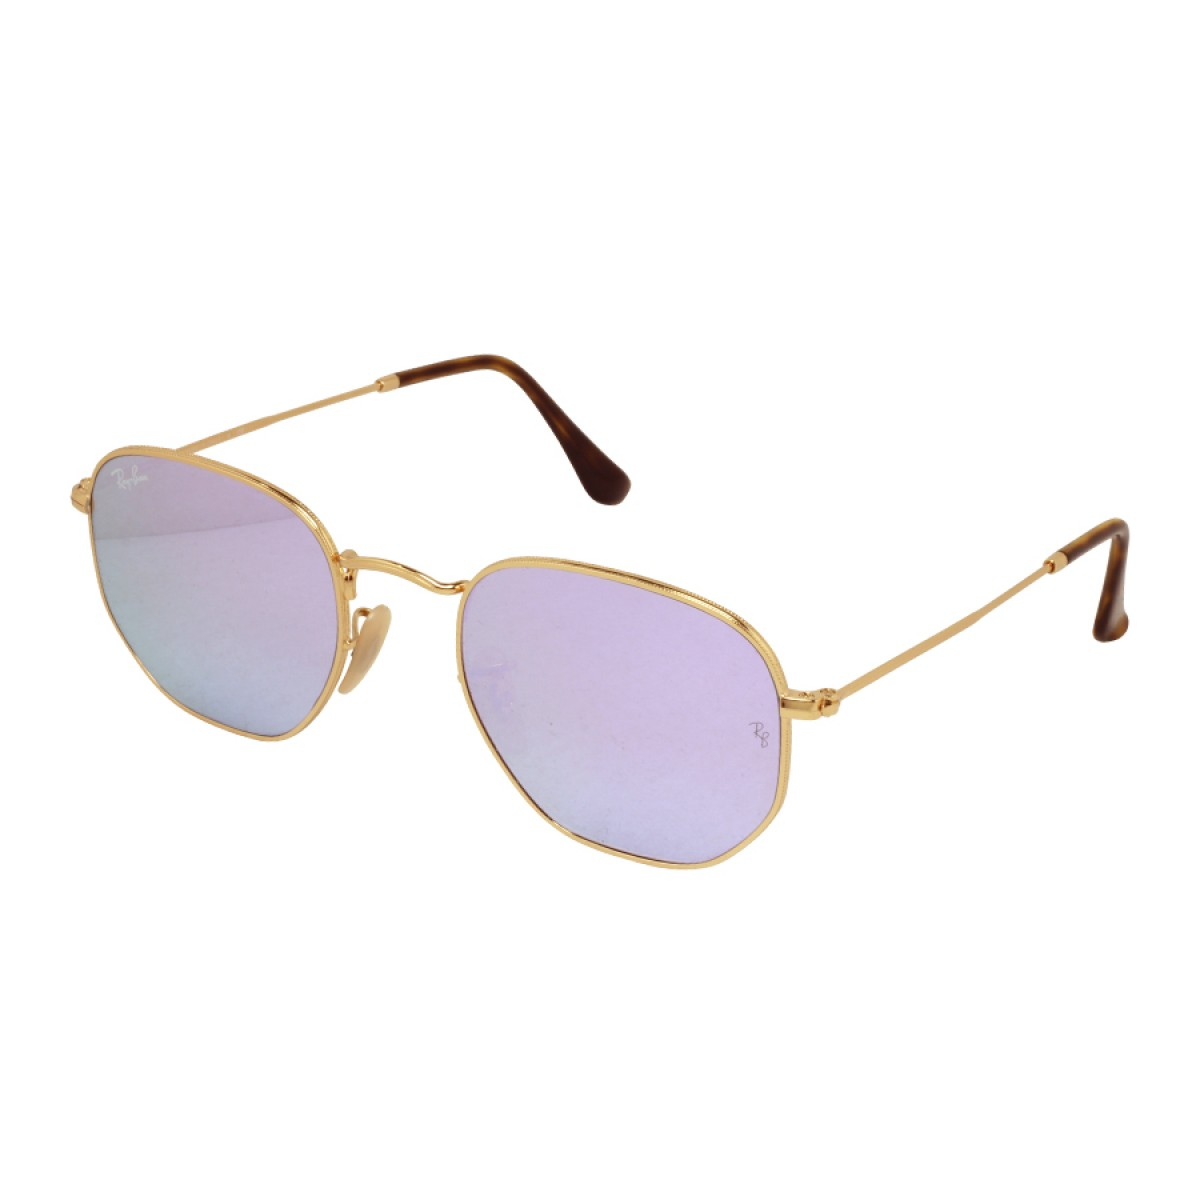 Ray Ban Hexagonal Flat Lens Lilac Mirror Unisex Sunglasses RB3548N-001 8O 6e24df8b10